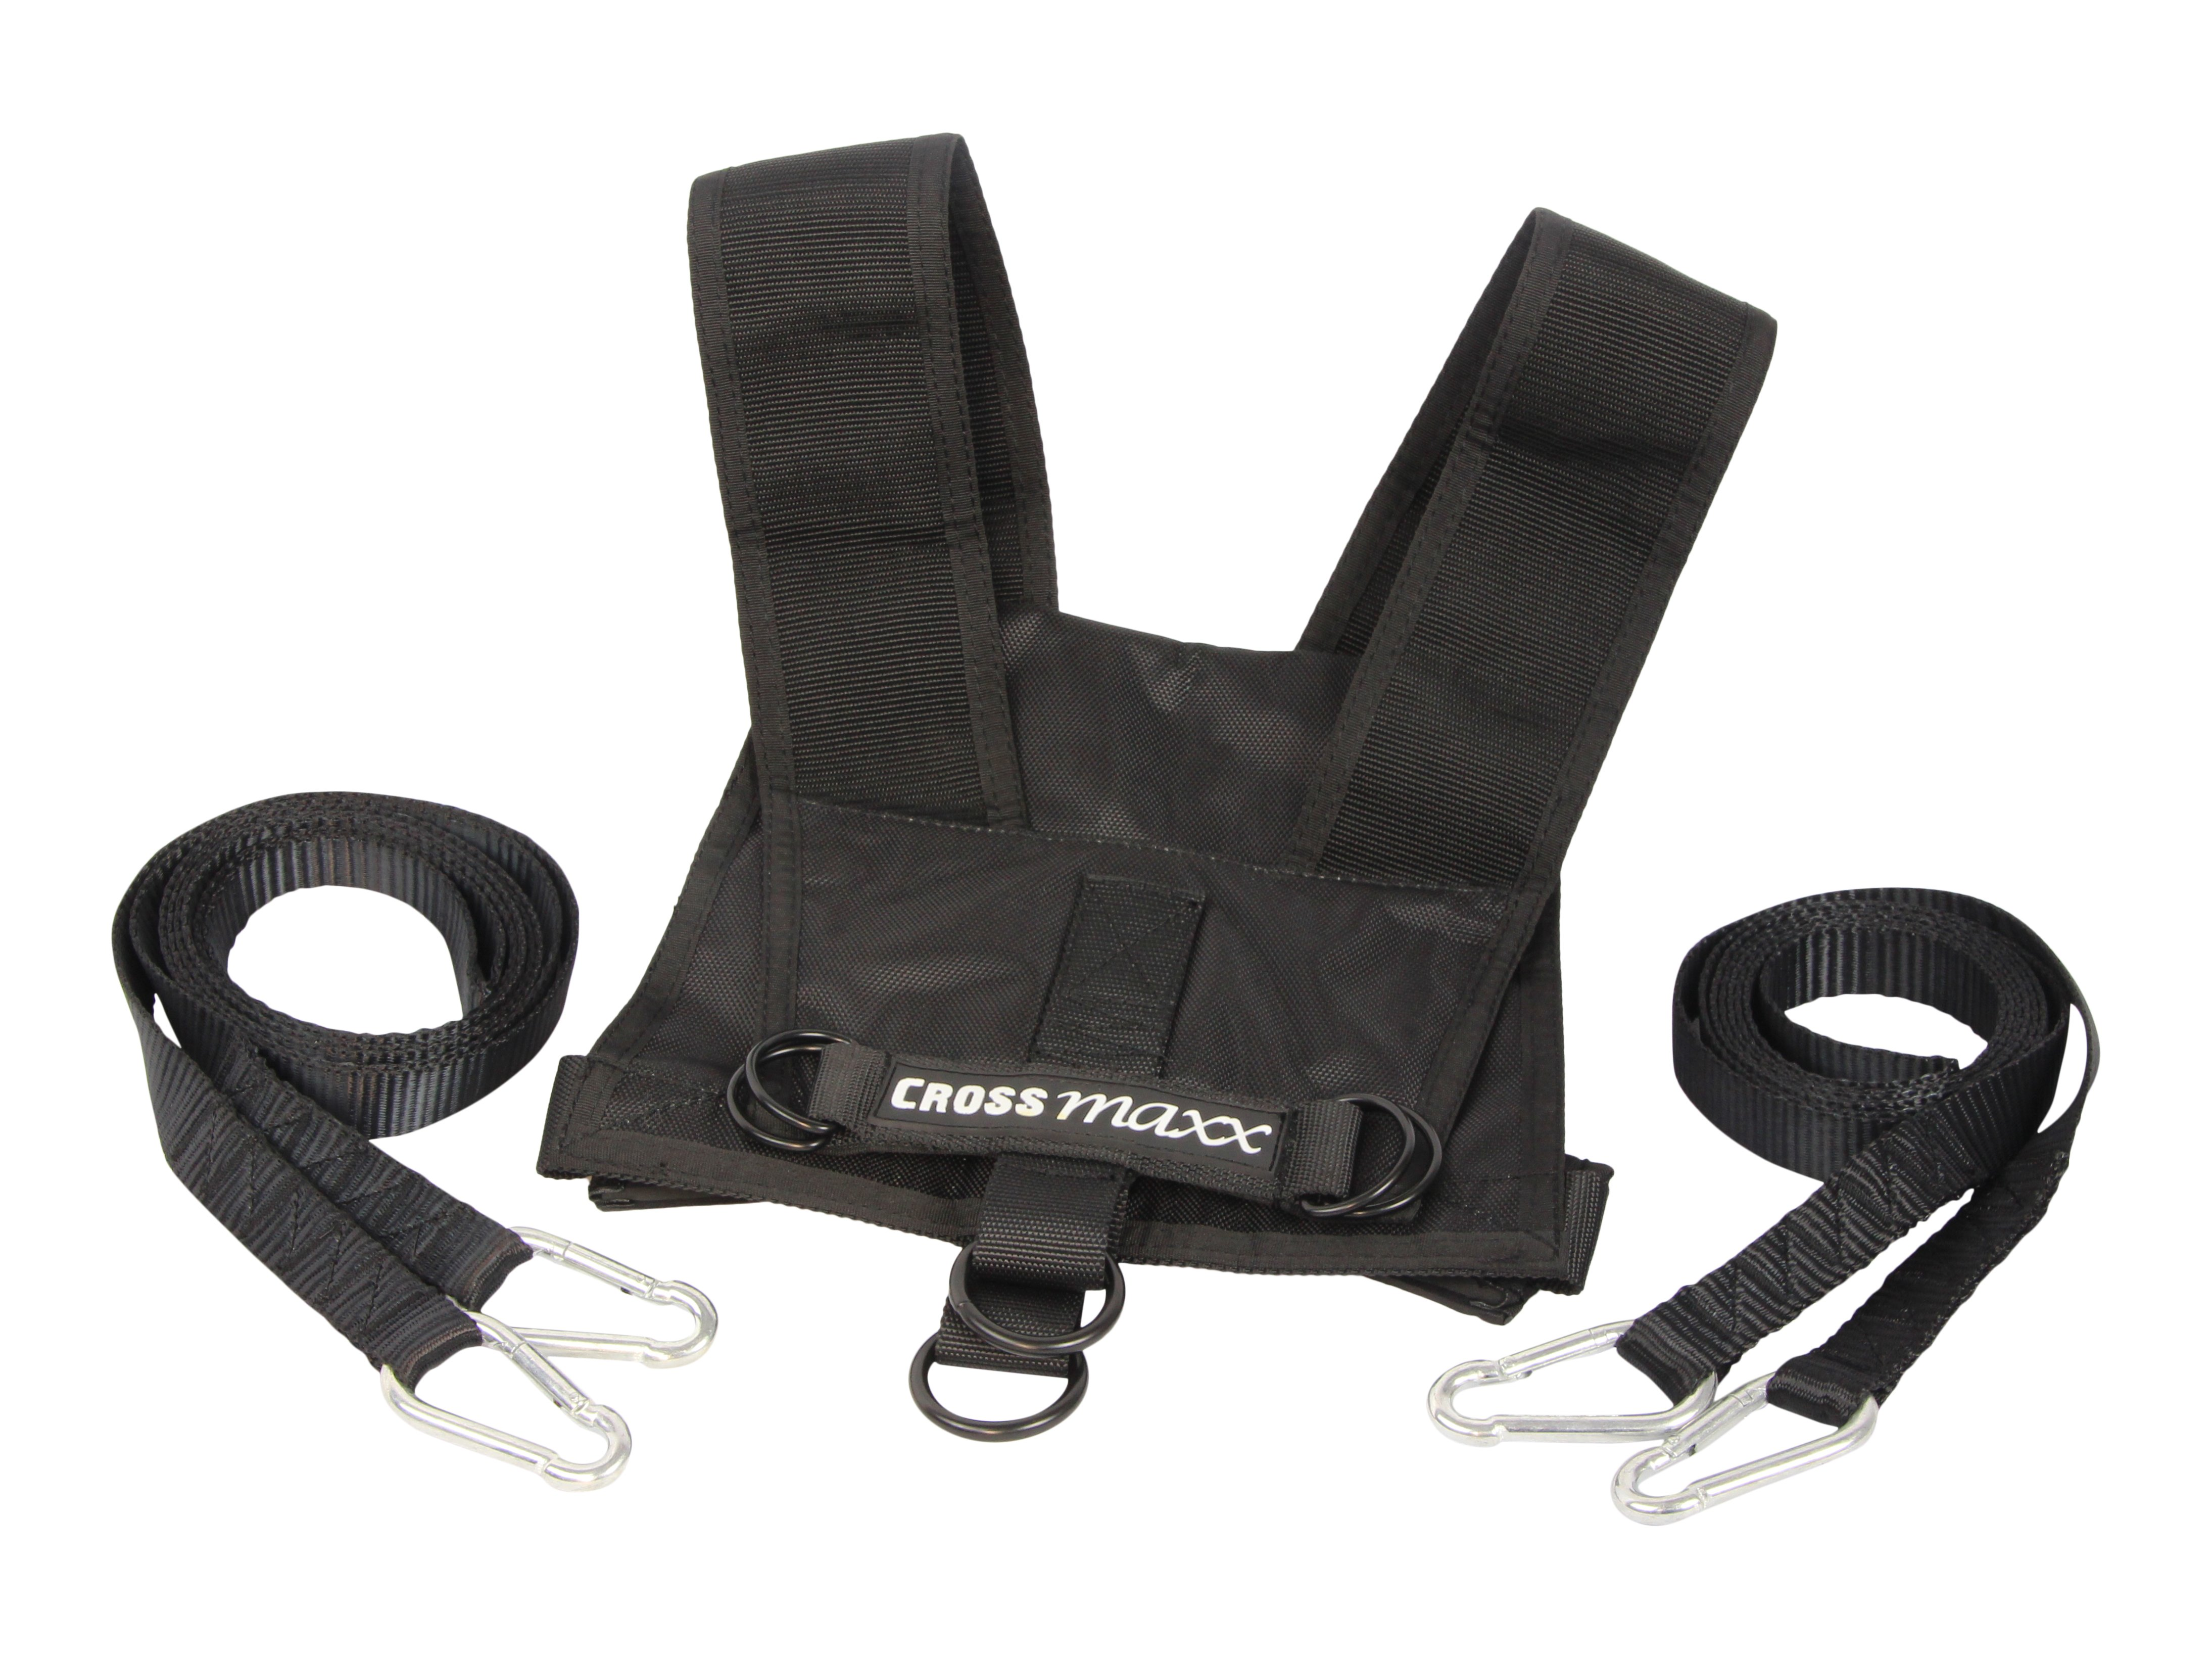 Crossmaxx Harness PRO Seler Til Slæde